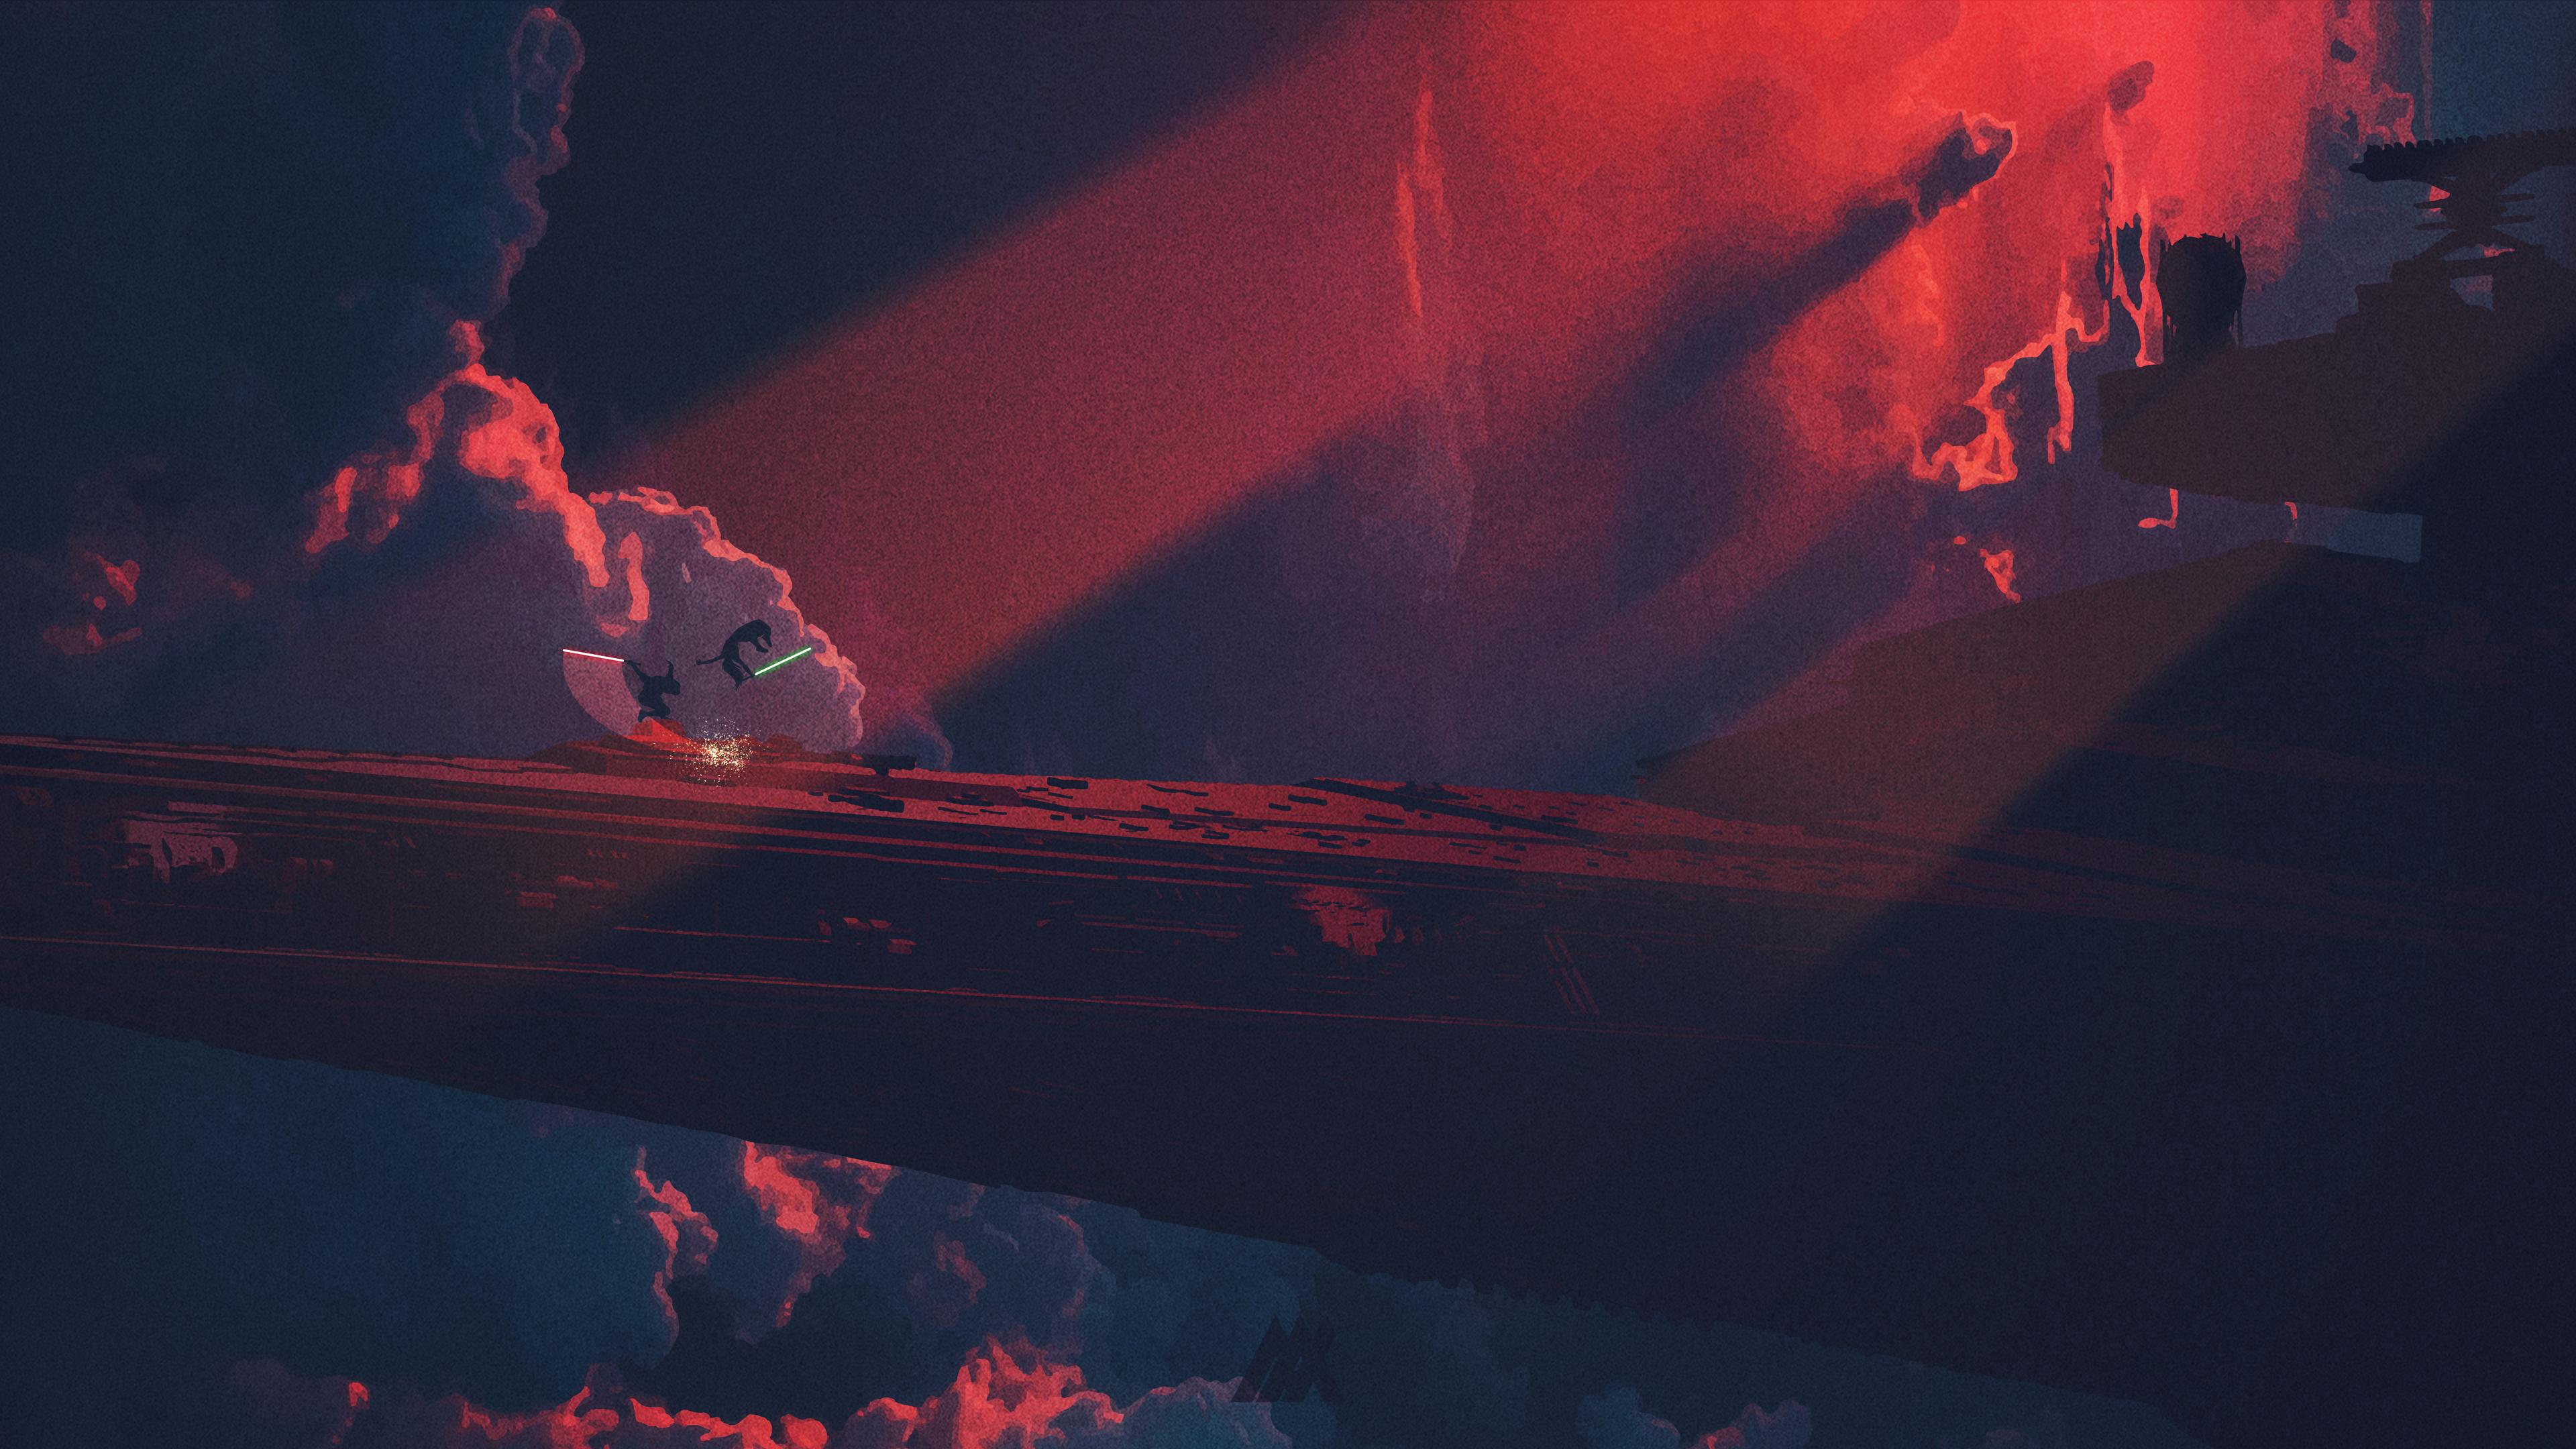 Wallpaper 4k Star Wars Star Destroyer Digital Art 4k 4k